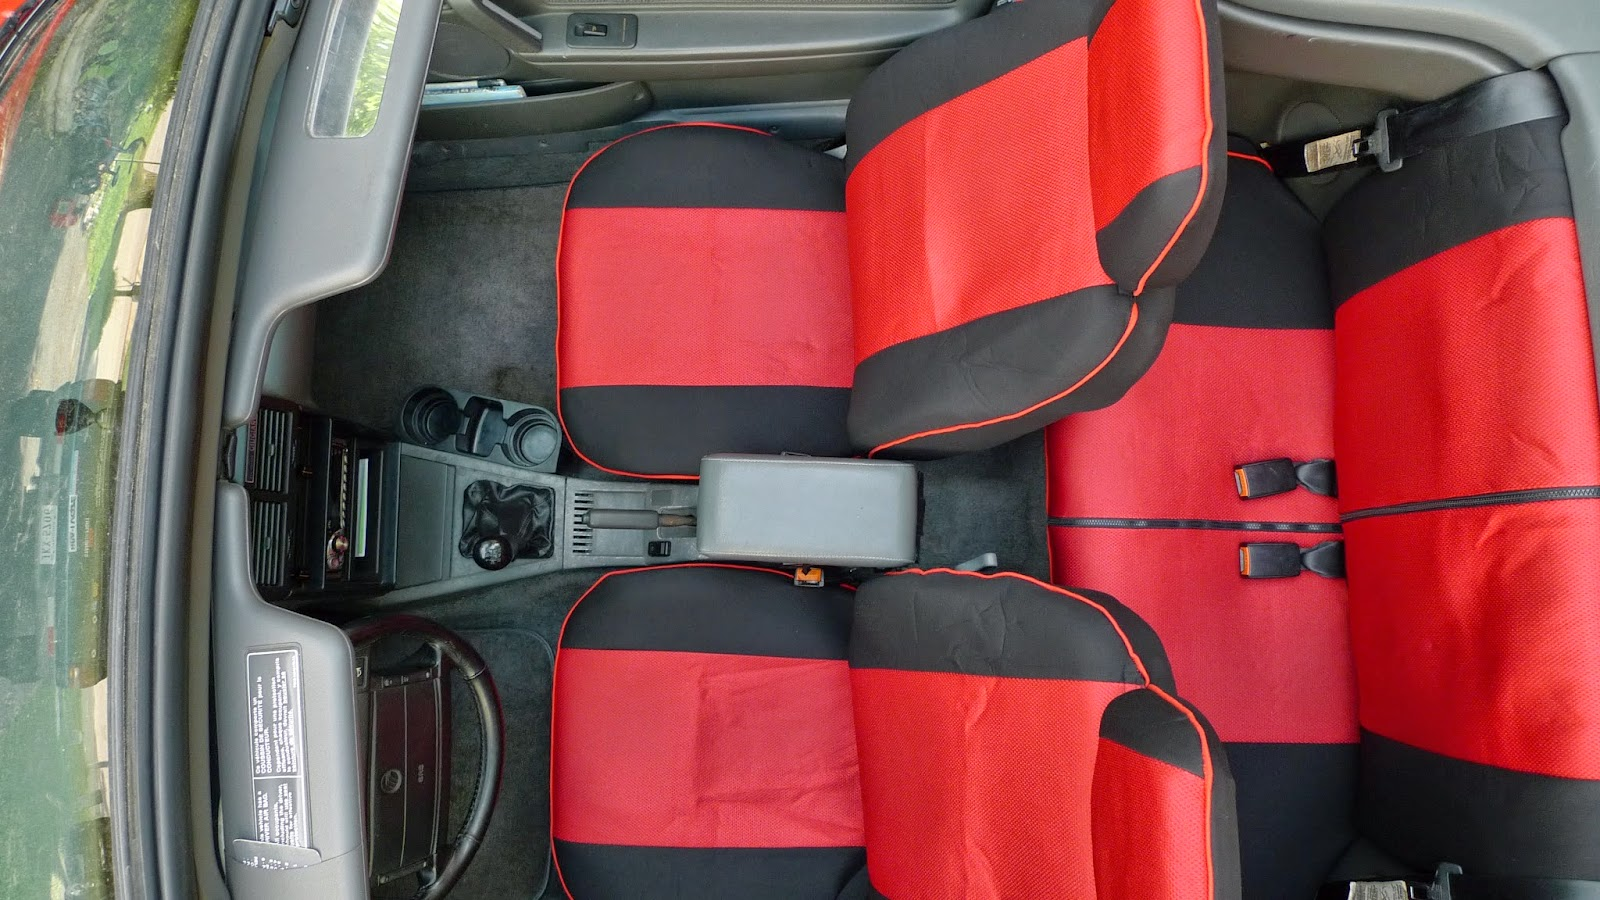 1993 Mercury Capri Fuse Box Electrical Wiring Diagrams Dodge Spirit Xr2 Residential Symbols U2022 Grand Marquis